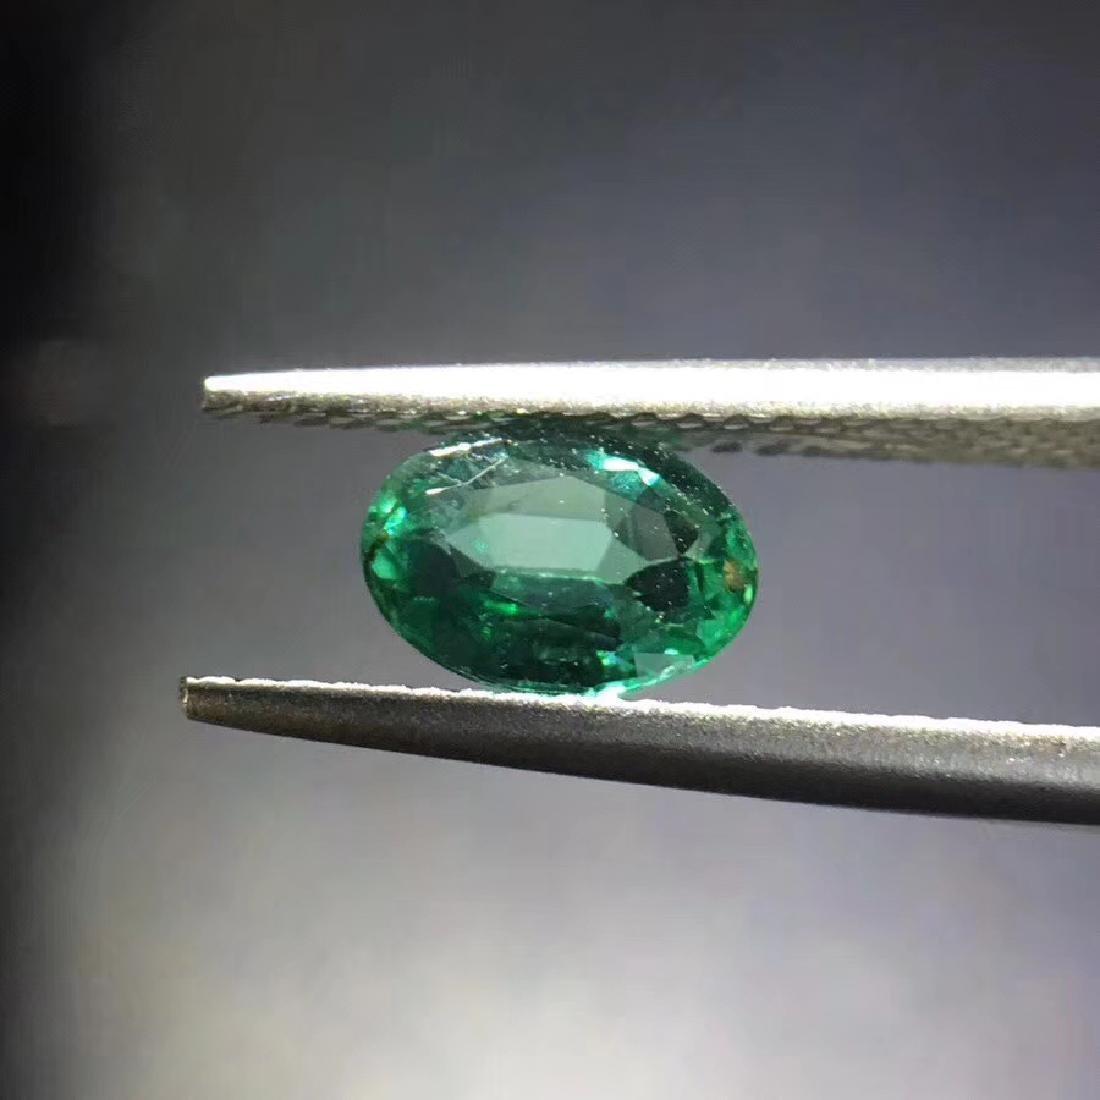 0.73 ct Emerald 5.0*7.0*2.9 mm Oval Cut